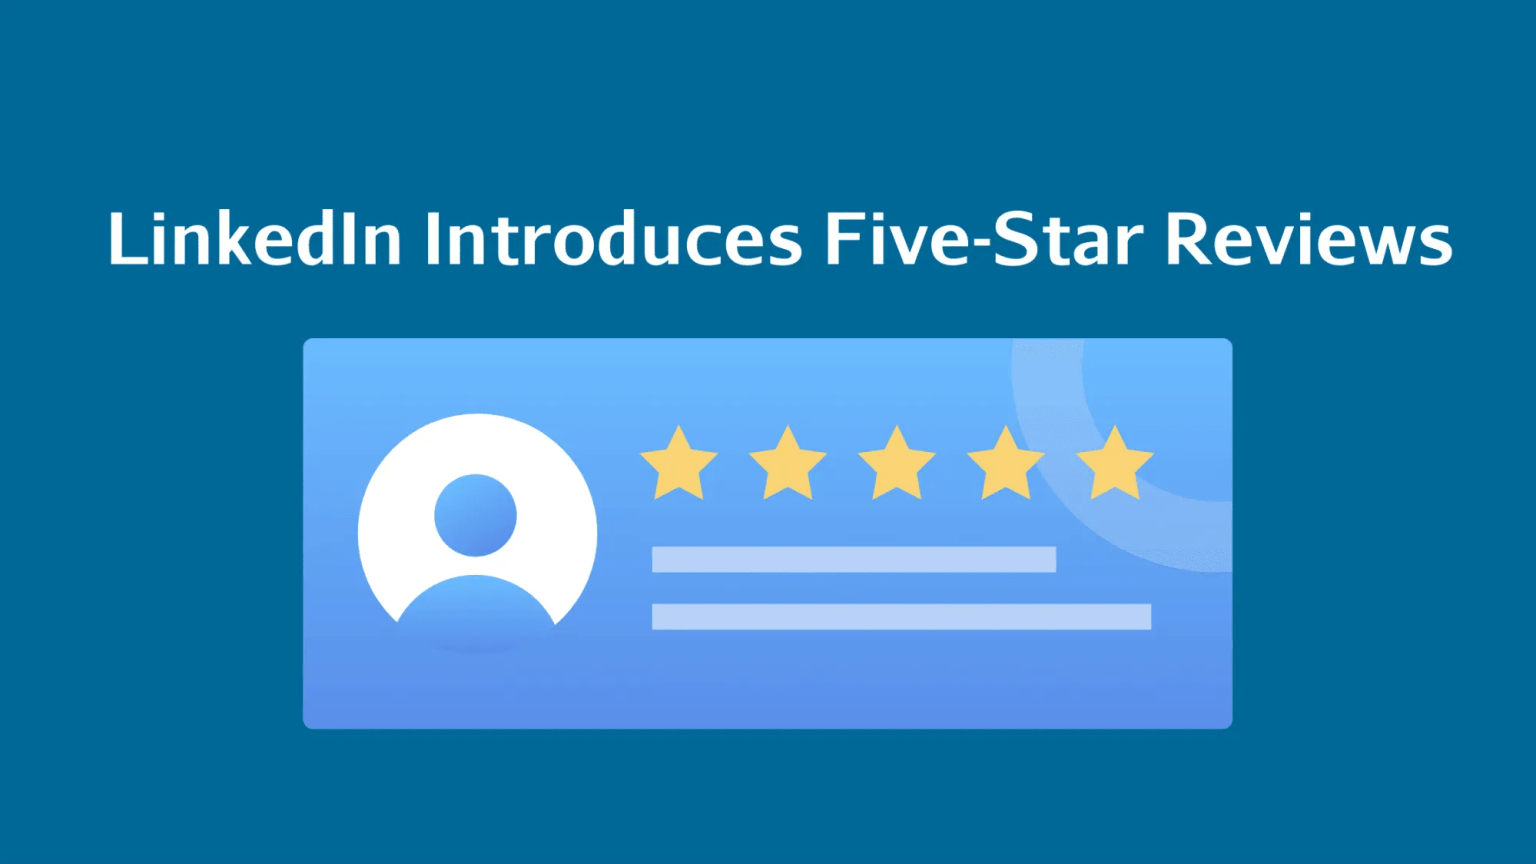 LinkedIn Introduces Five-Star Reviews - LinkedIn for Business